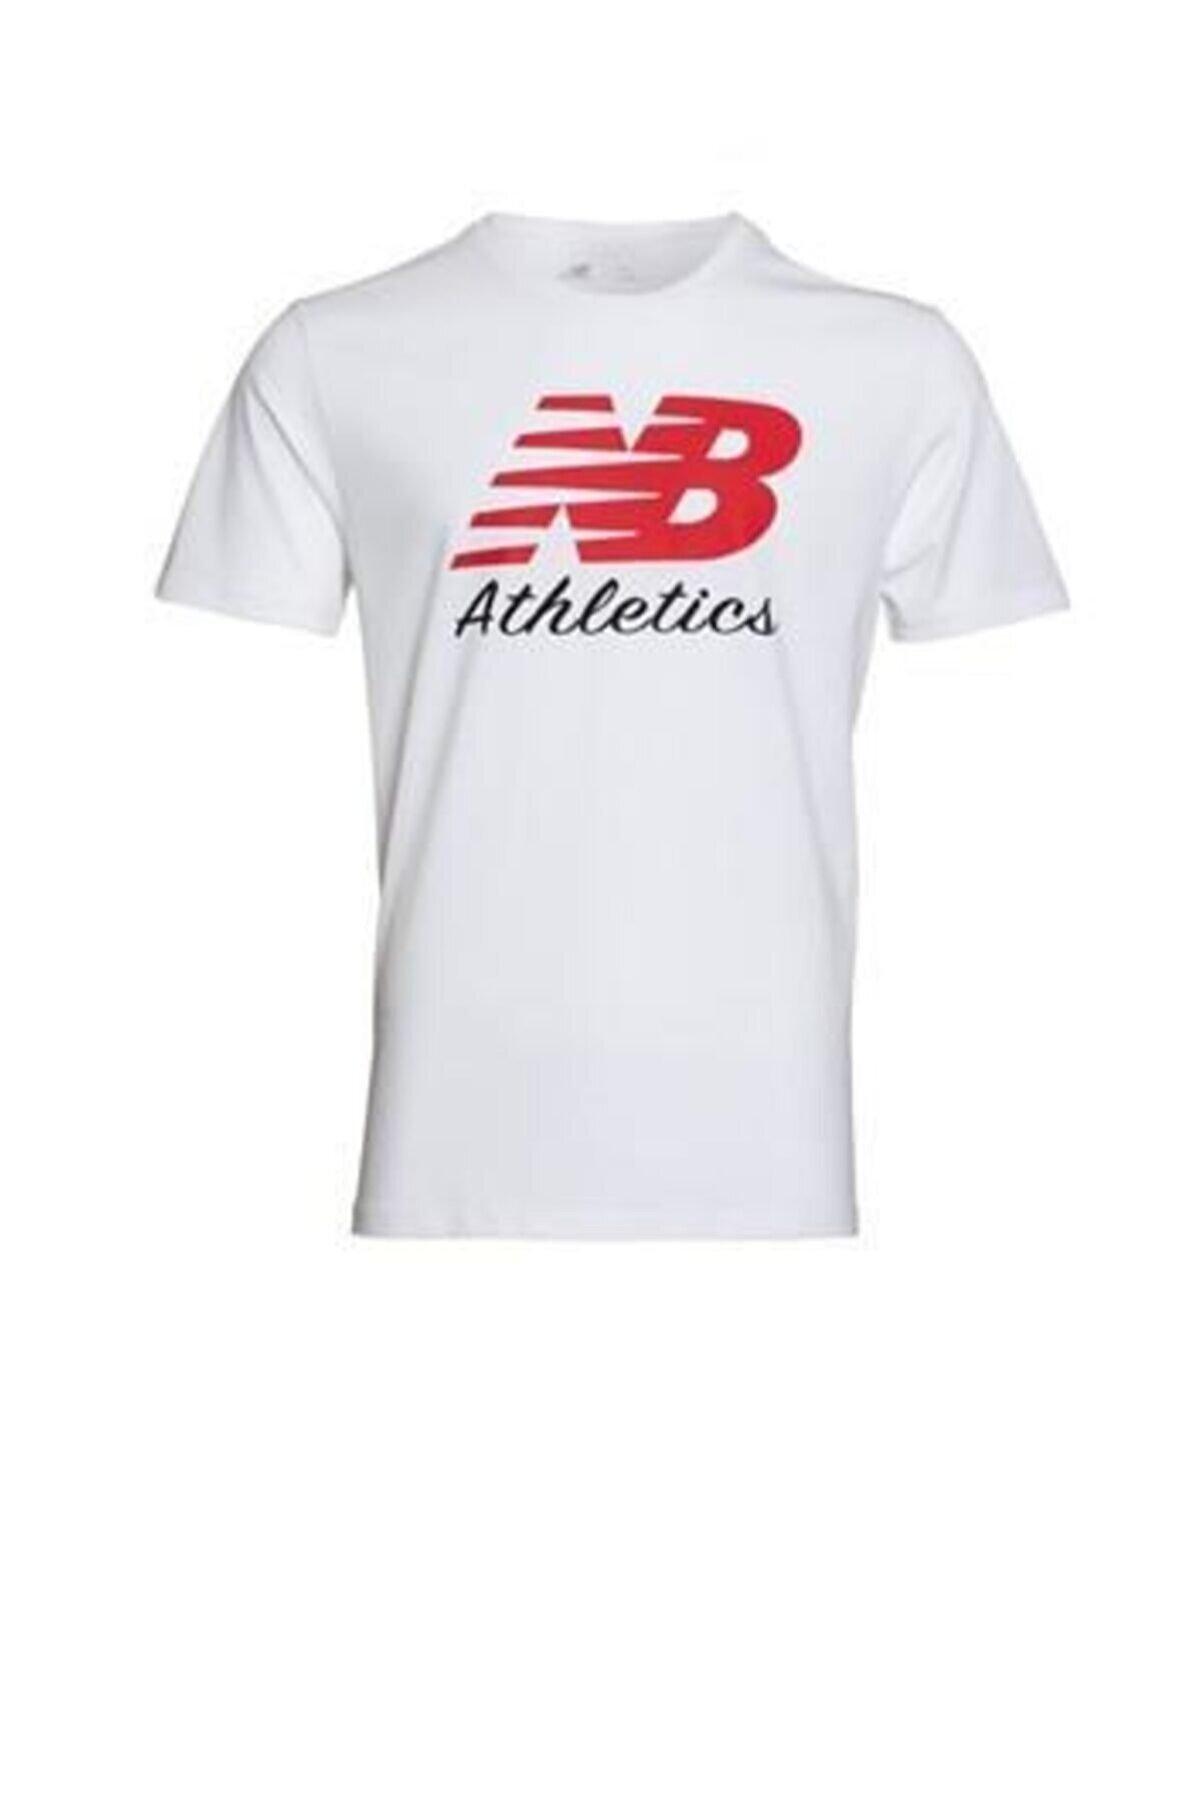 New Balance Athletics Mens Tee Mps002